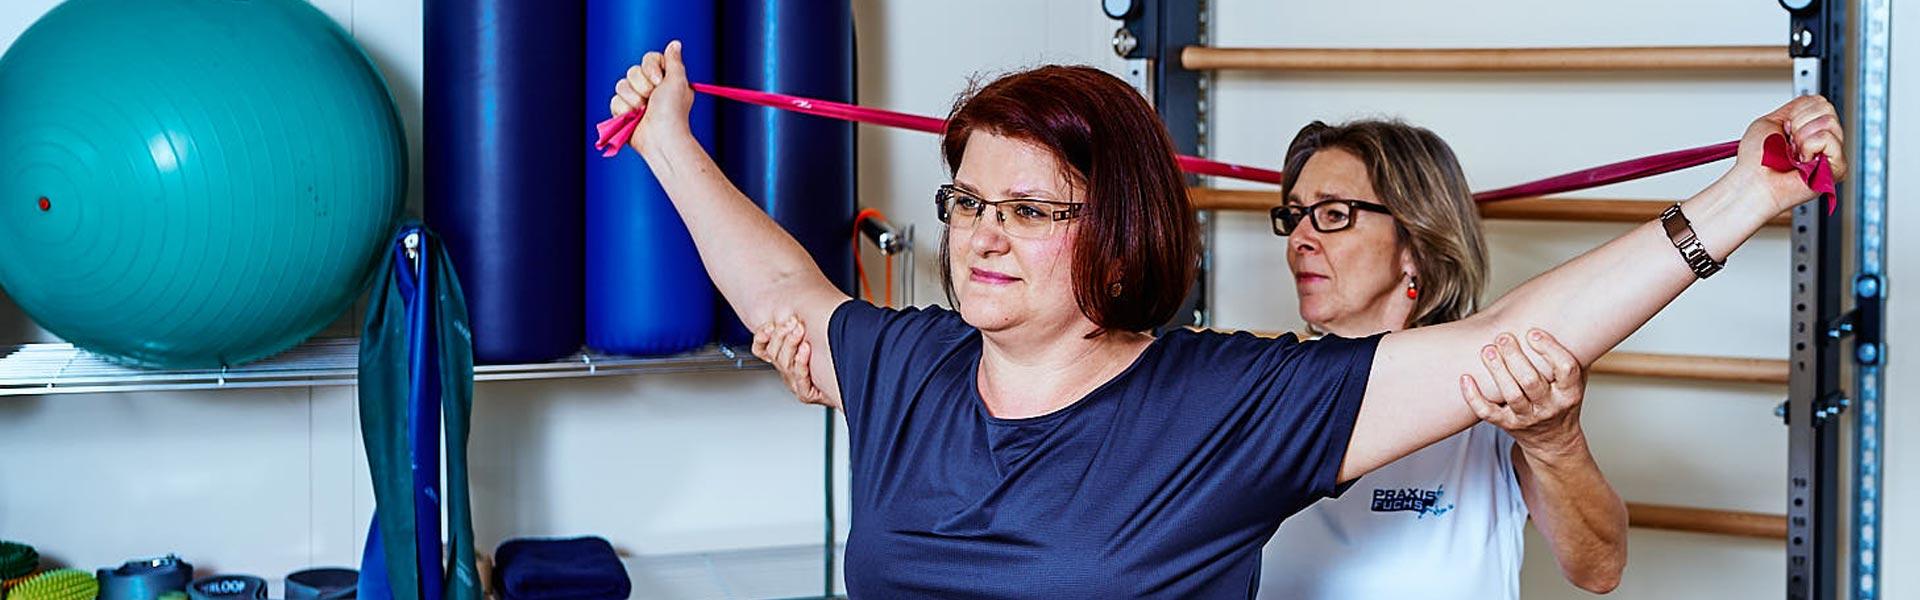 Praxis Fuchs Physiotherapie Osteotherapie Krankengymnastik Rottweil